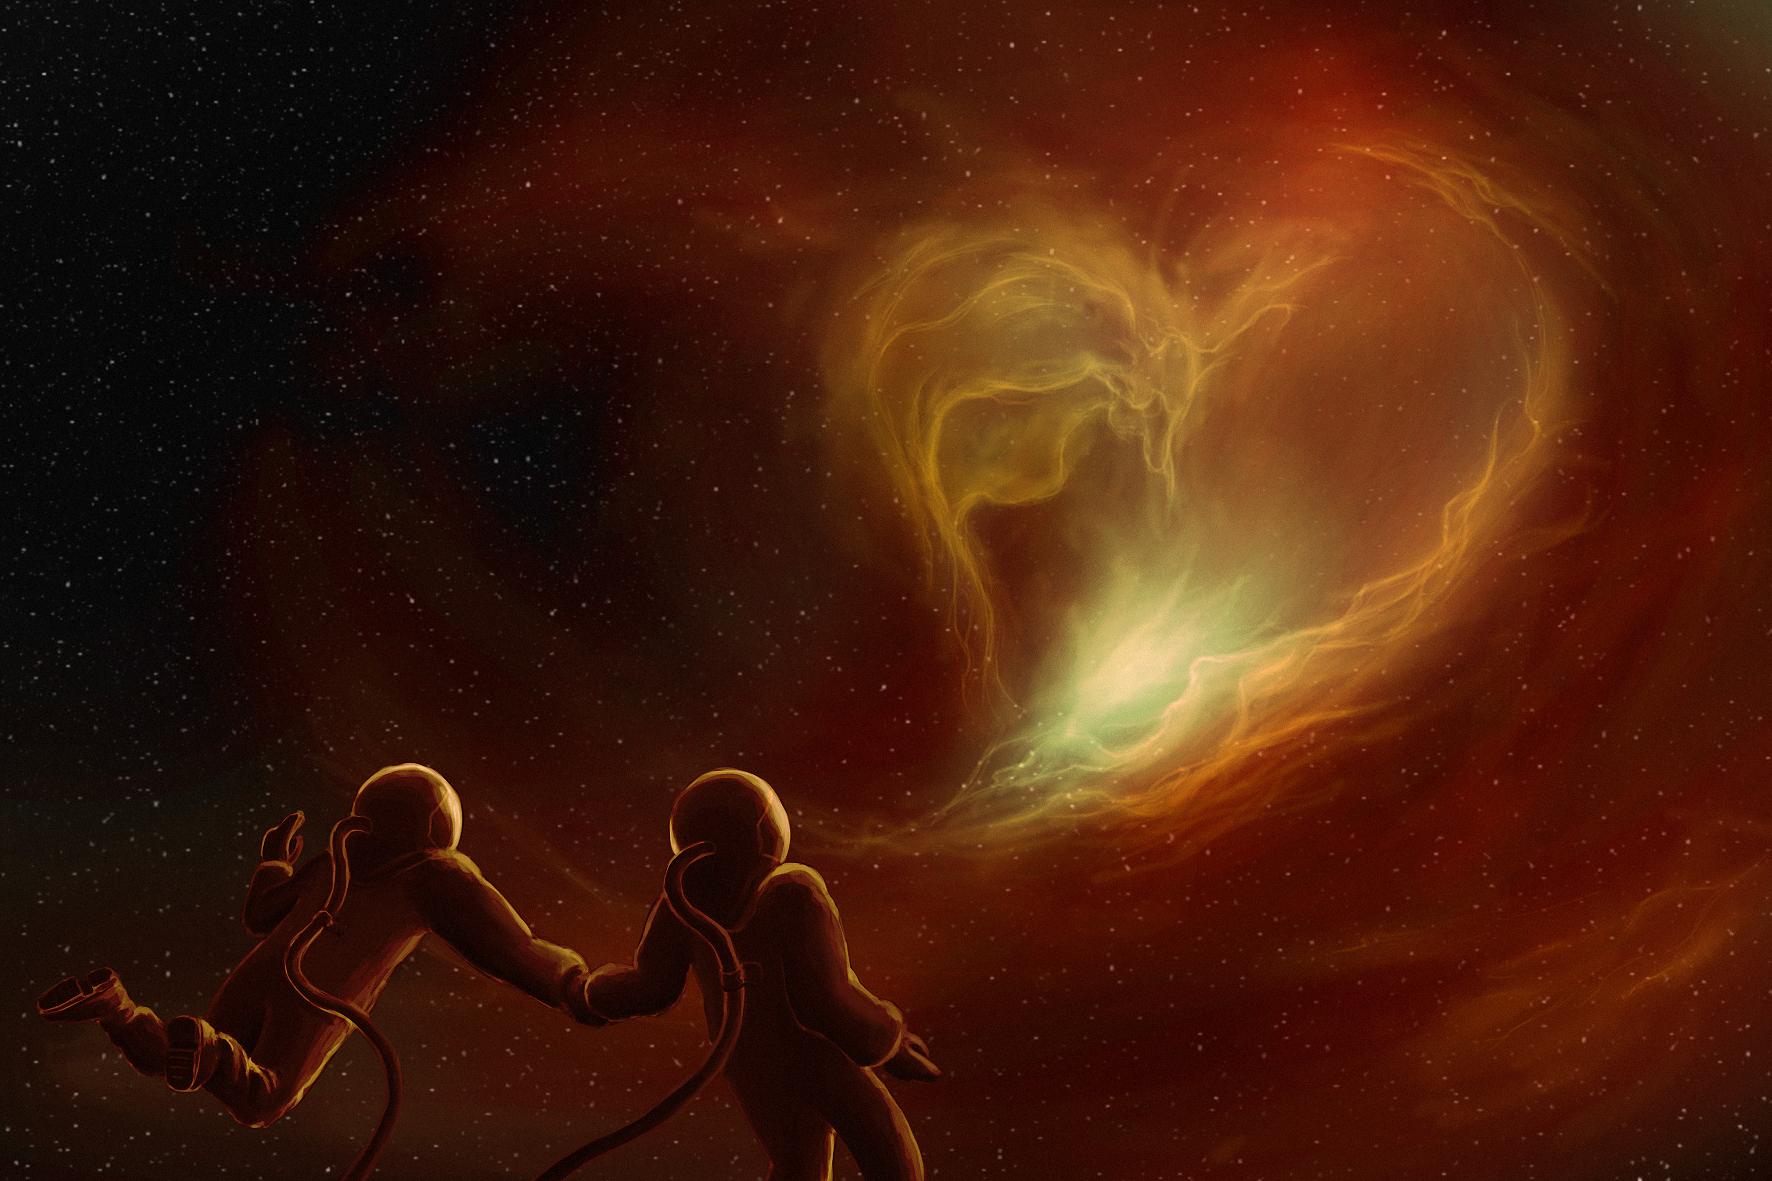 Intergalactic valentine